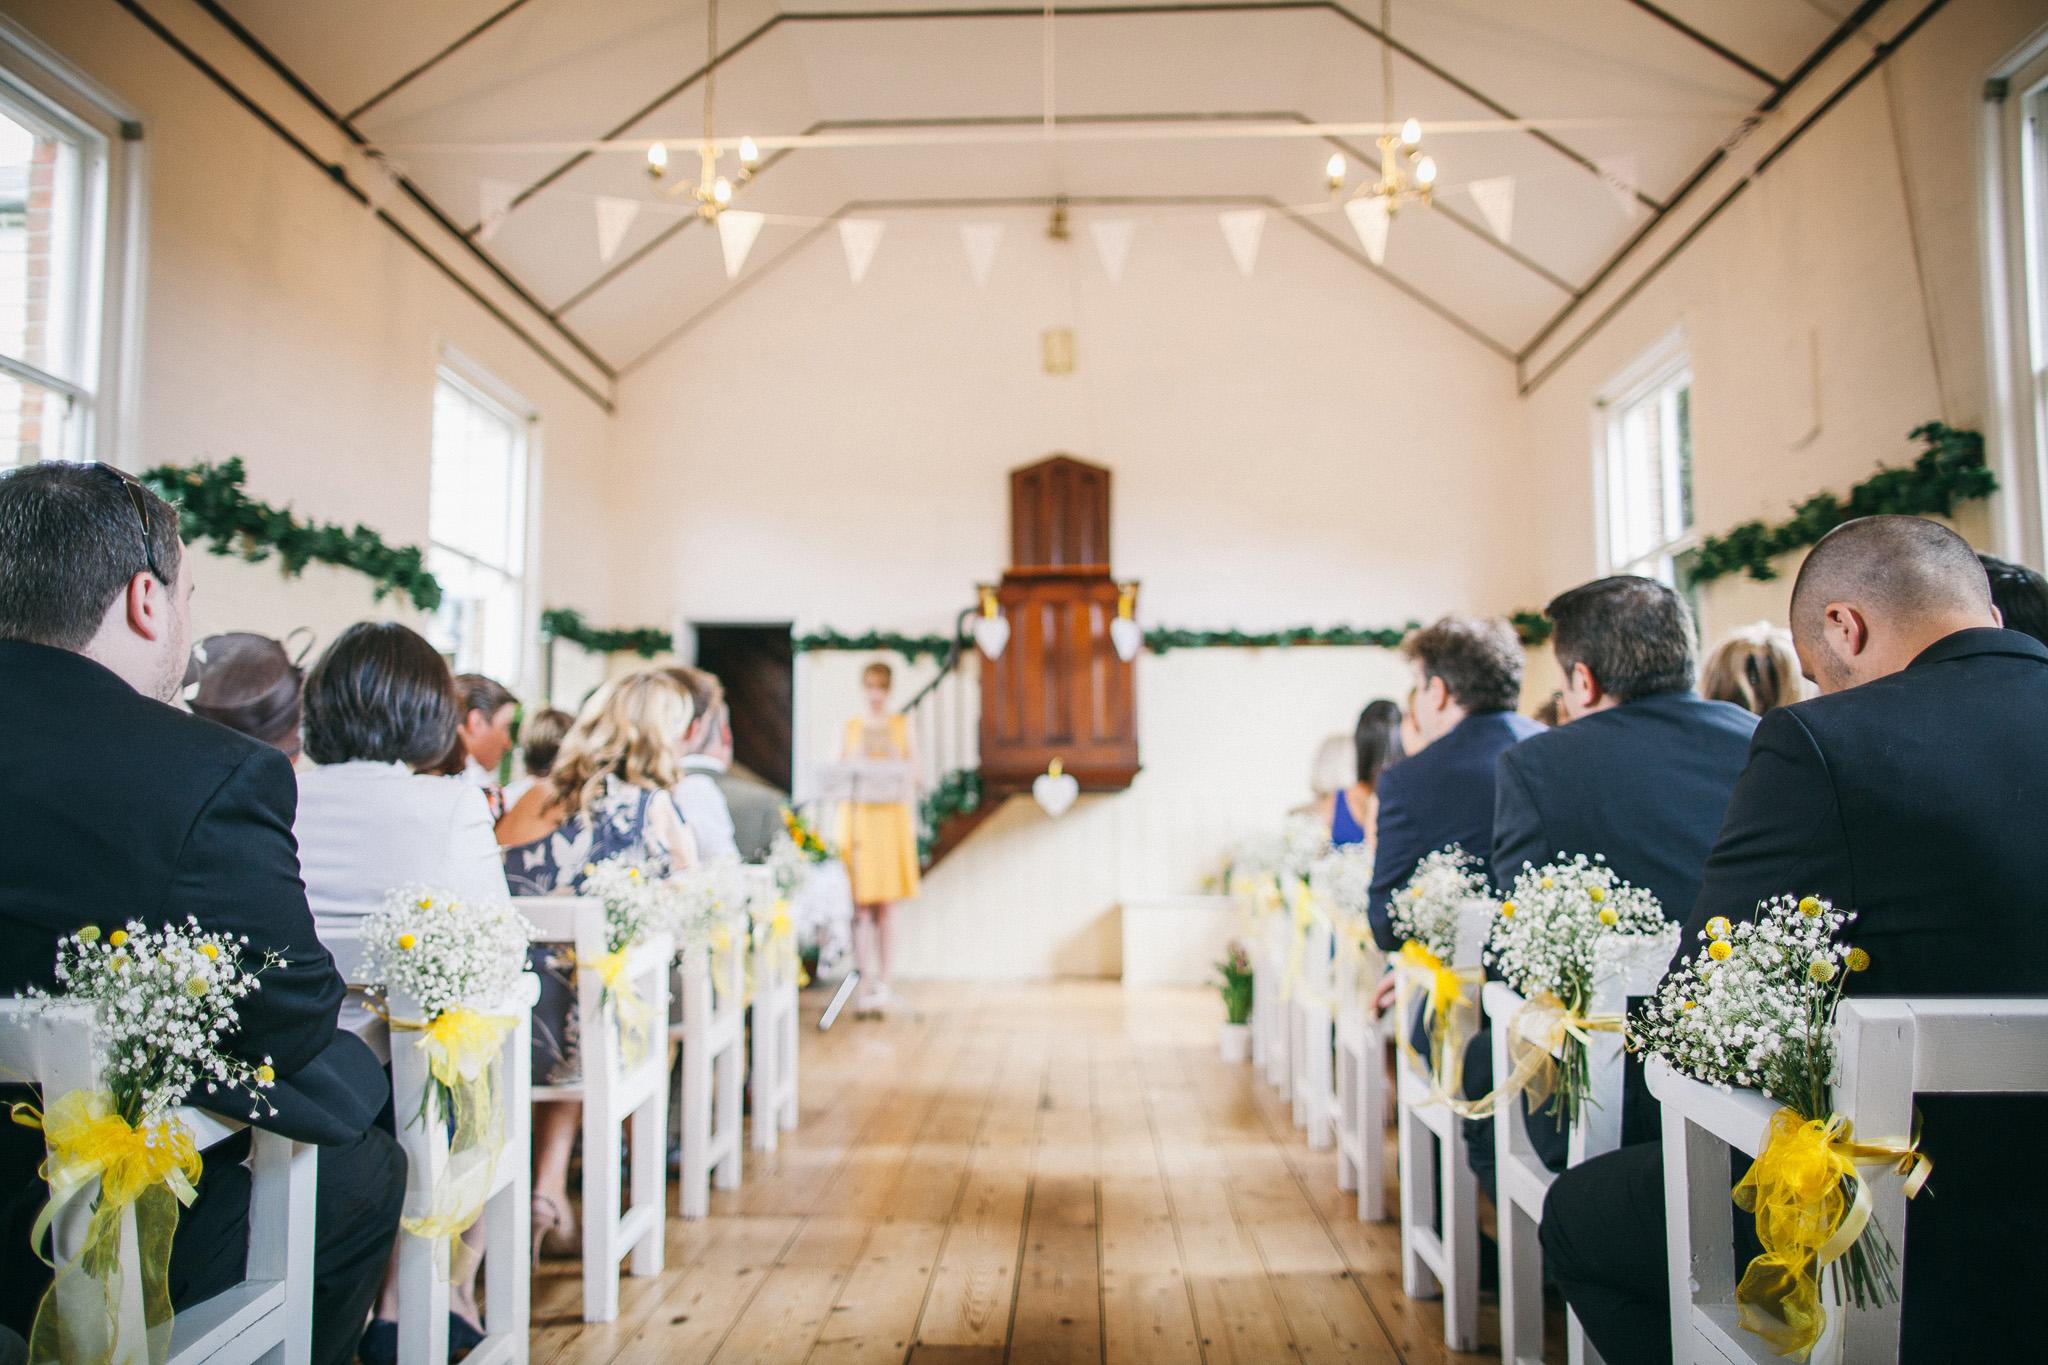 chantry_sussex_barn_wedding_312.jpg